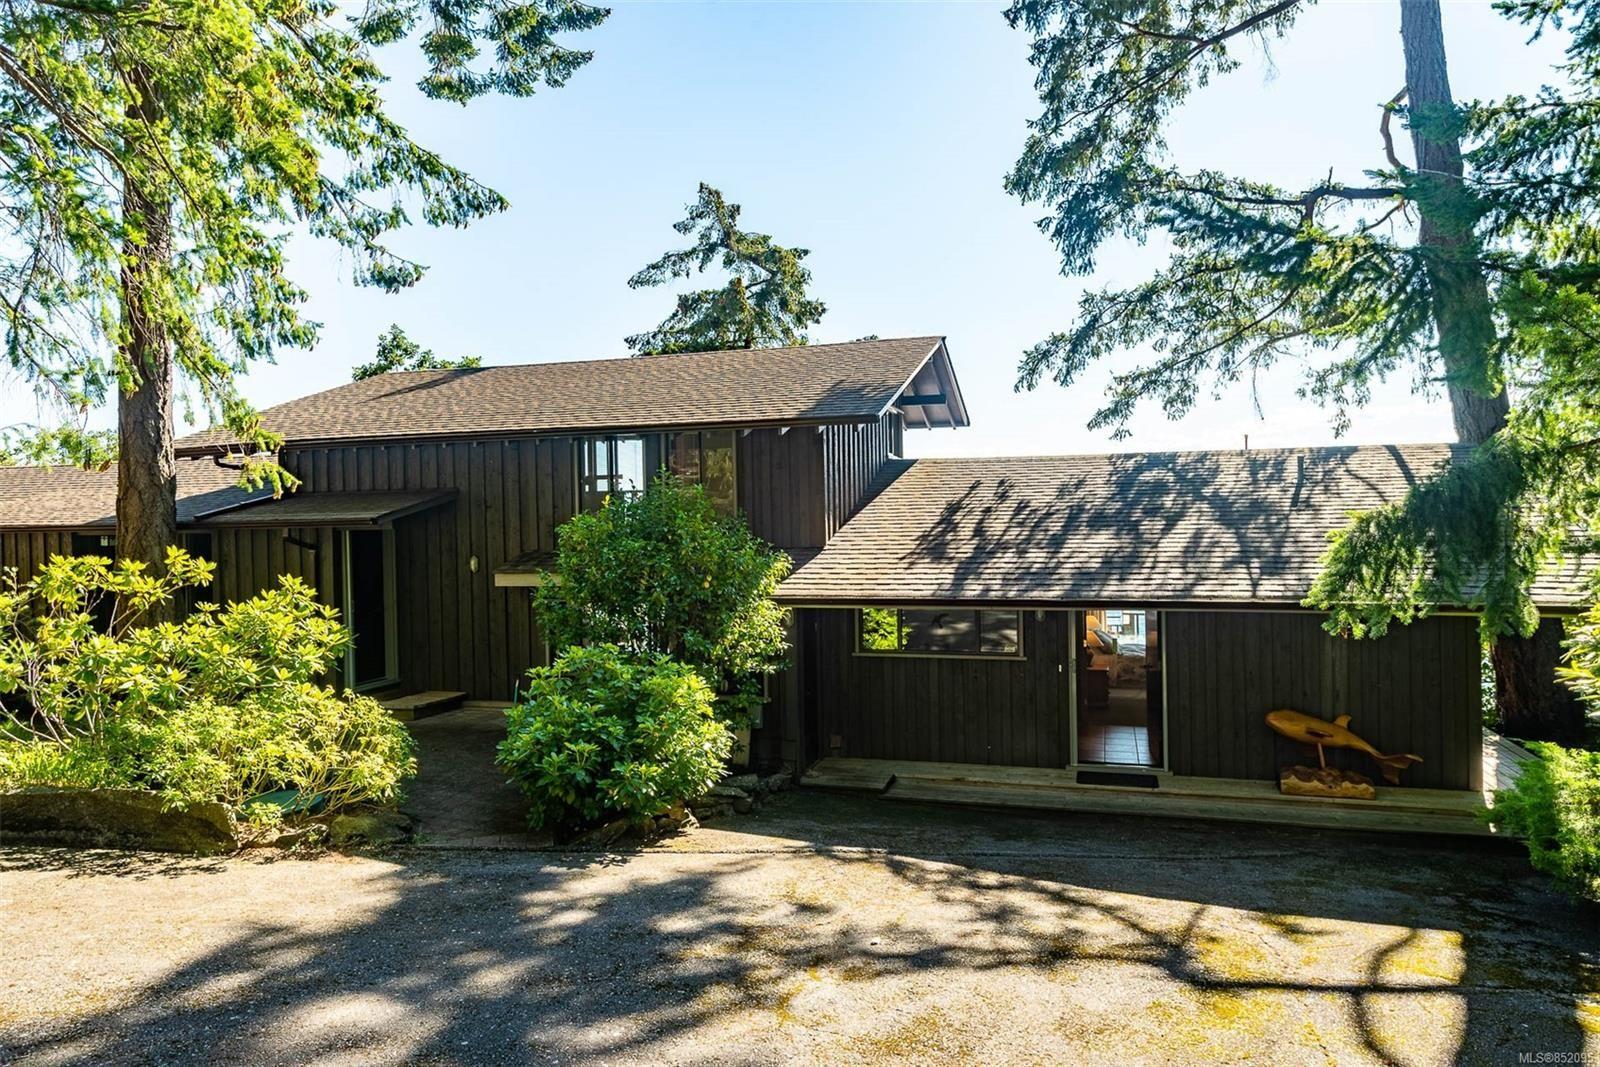 Photo 31: Photos: 236 McGill Rd in : GI Salt Spring House for sale (Gulf Islands)  : MLS®# 852095